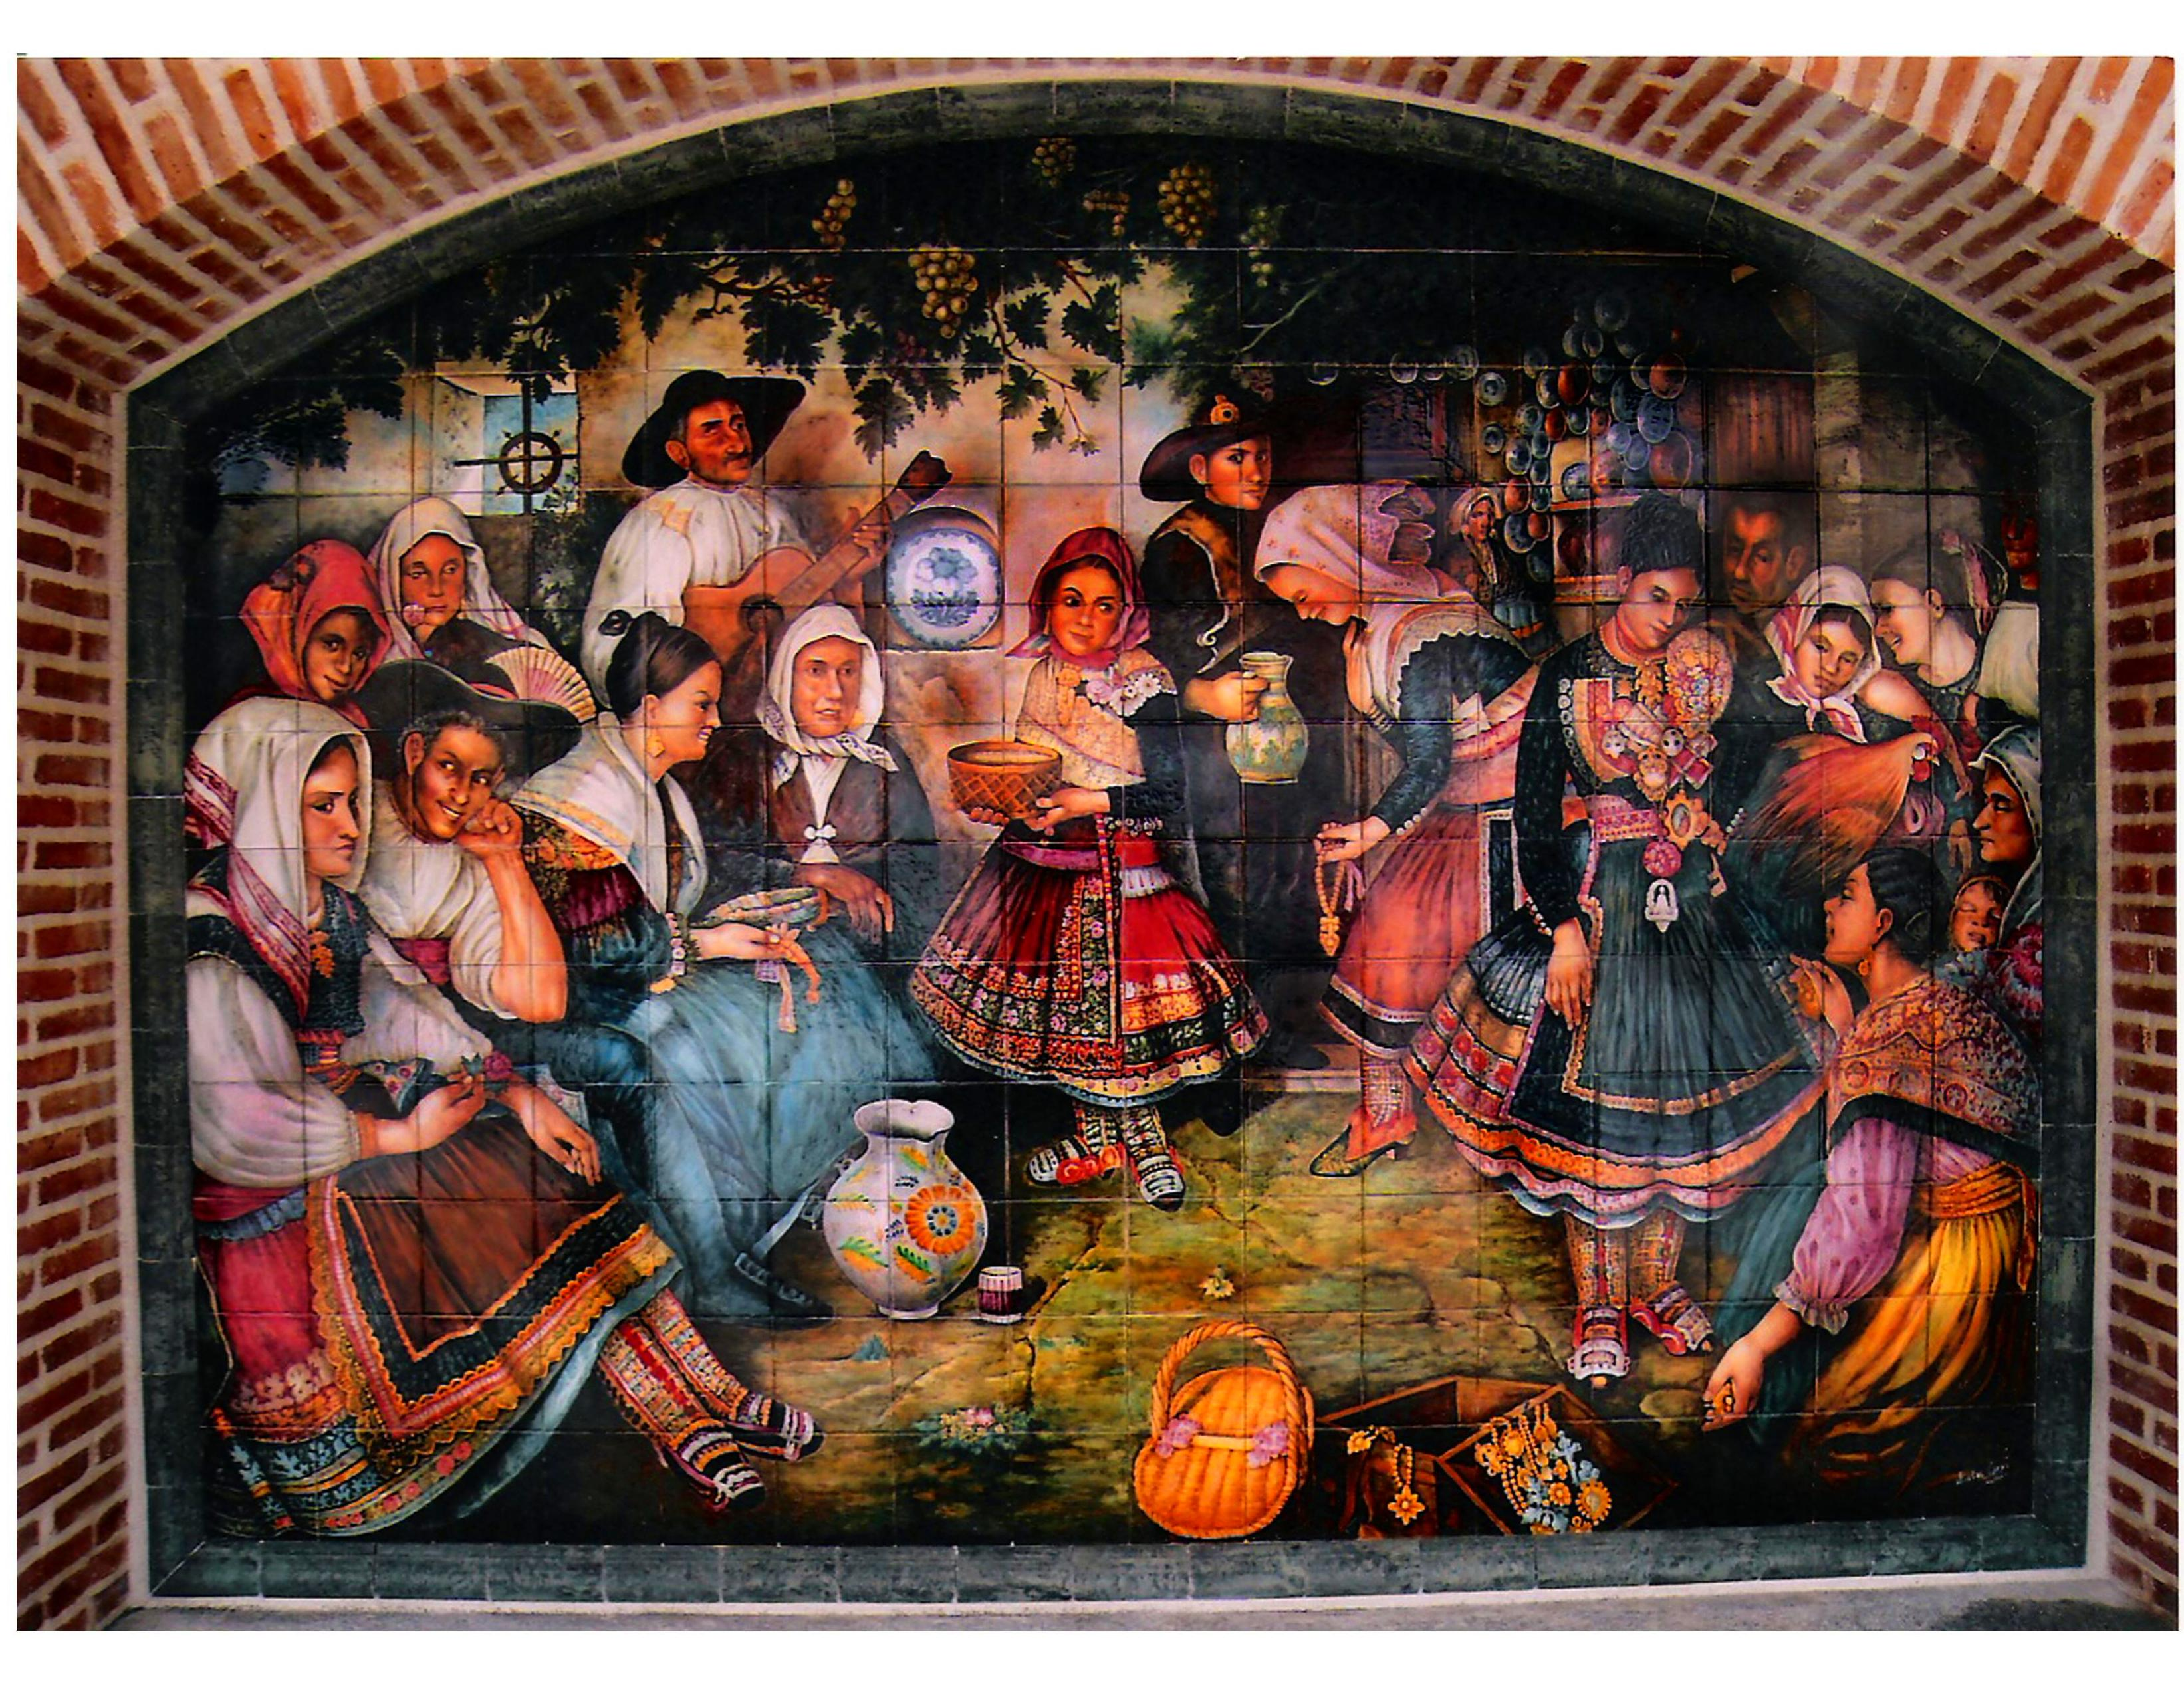 Foto 4 de cer mica art stica y popular en talavera de la - Murales de ceramica artistica ...